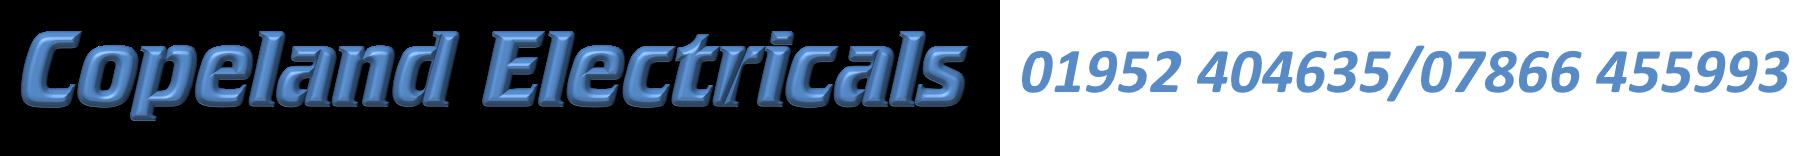 Copeland Electricals